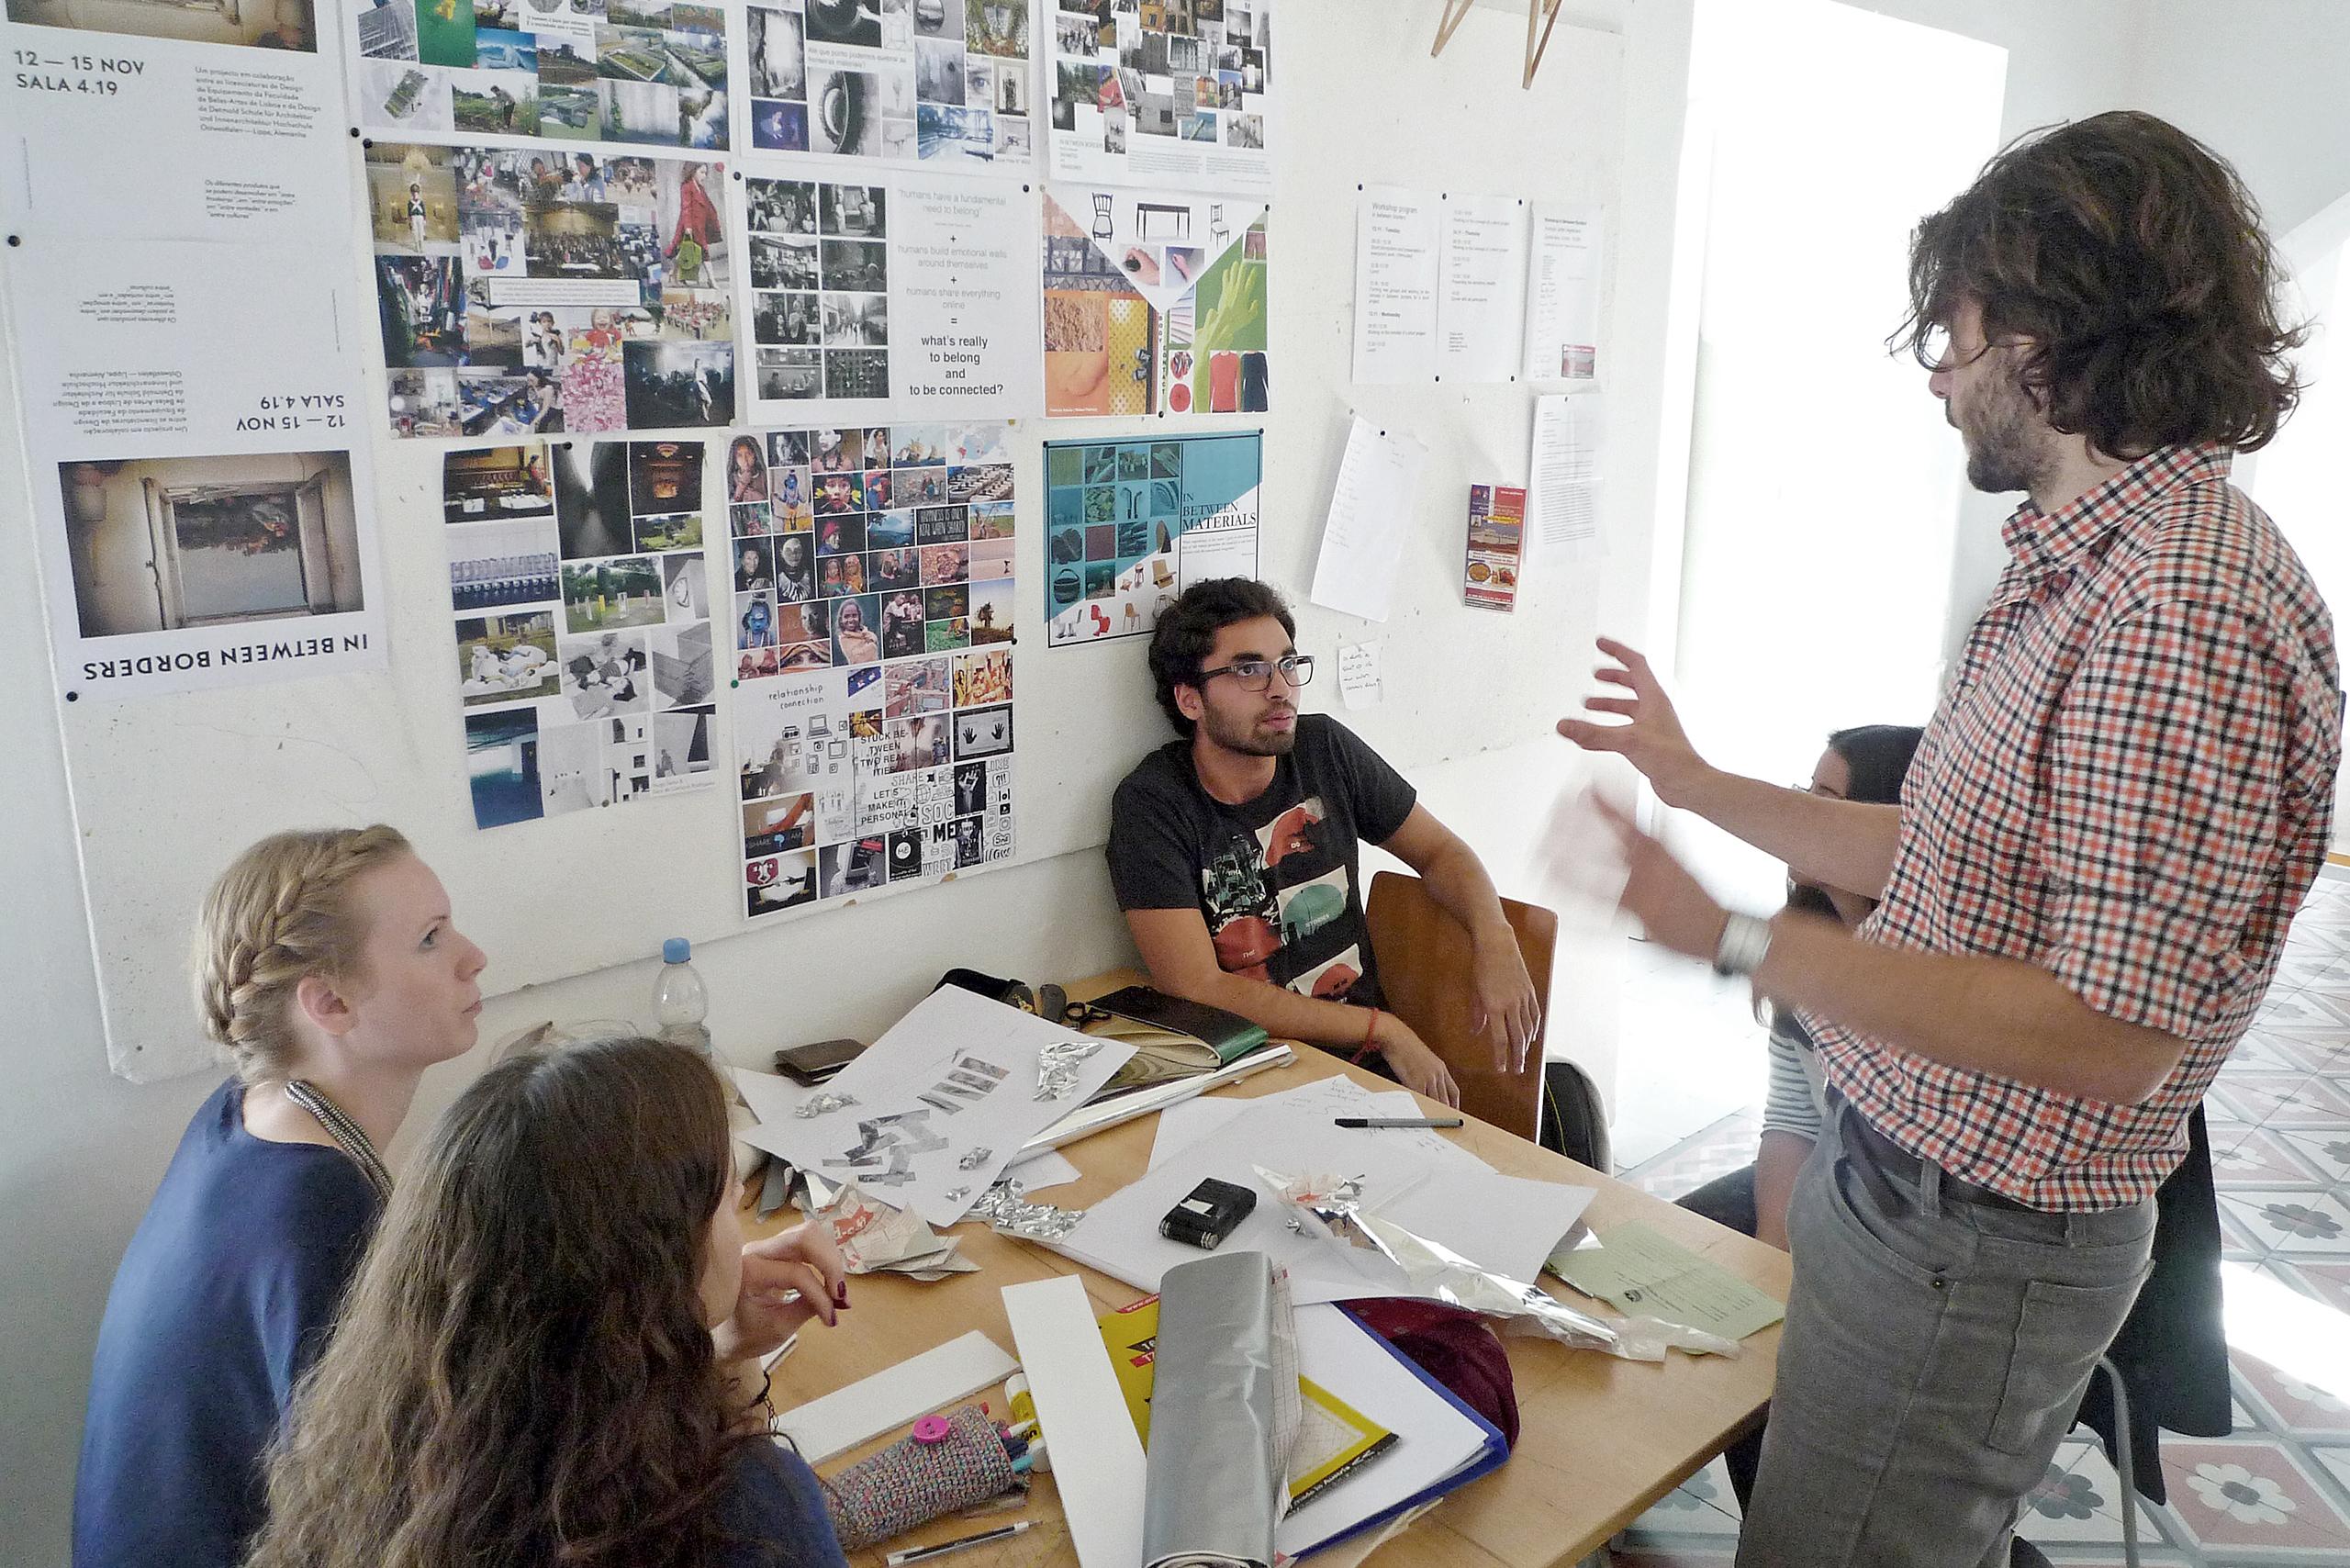 Workshop at the FBAUL | Photo: Clara Walter